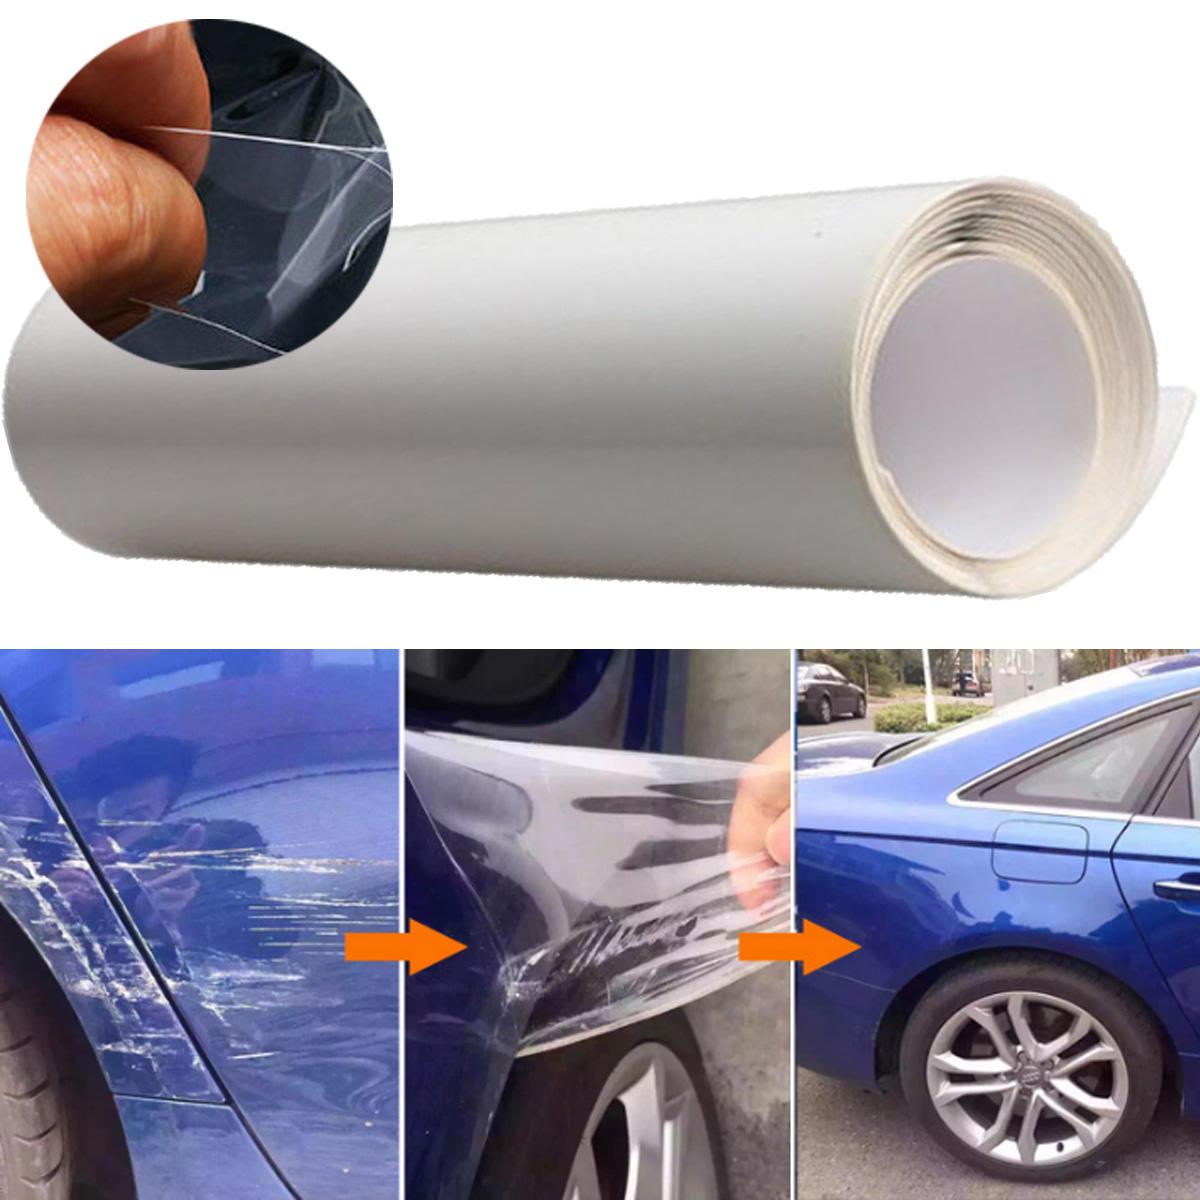 40x200cm Car Door Edge Clear Protective Satin Finish Vinyl Wrap Guard Film Sheet Transparent Sticker Cover Coat